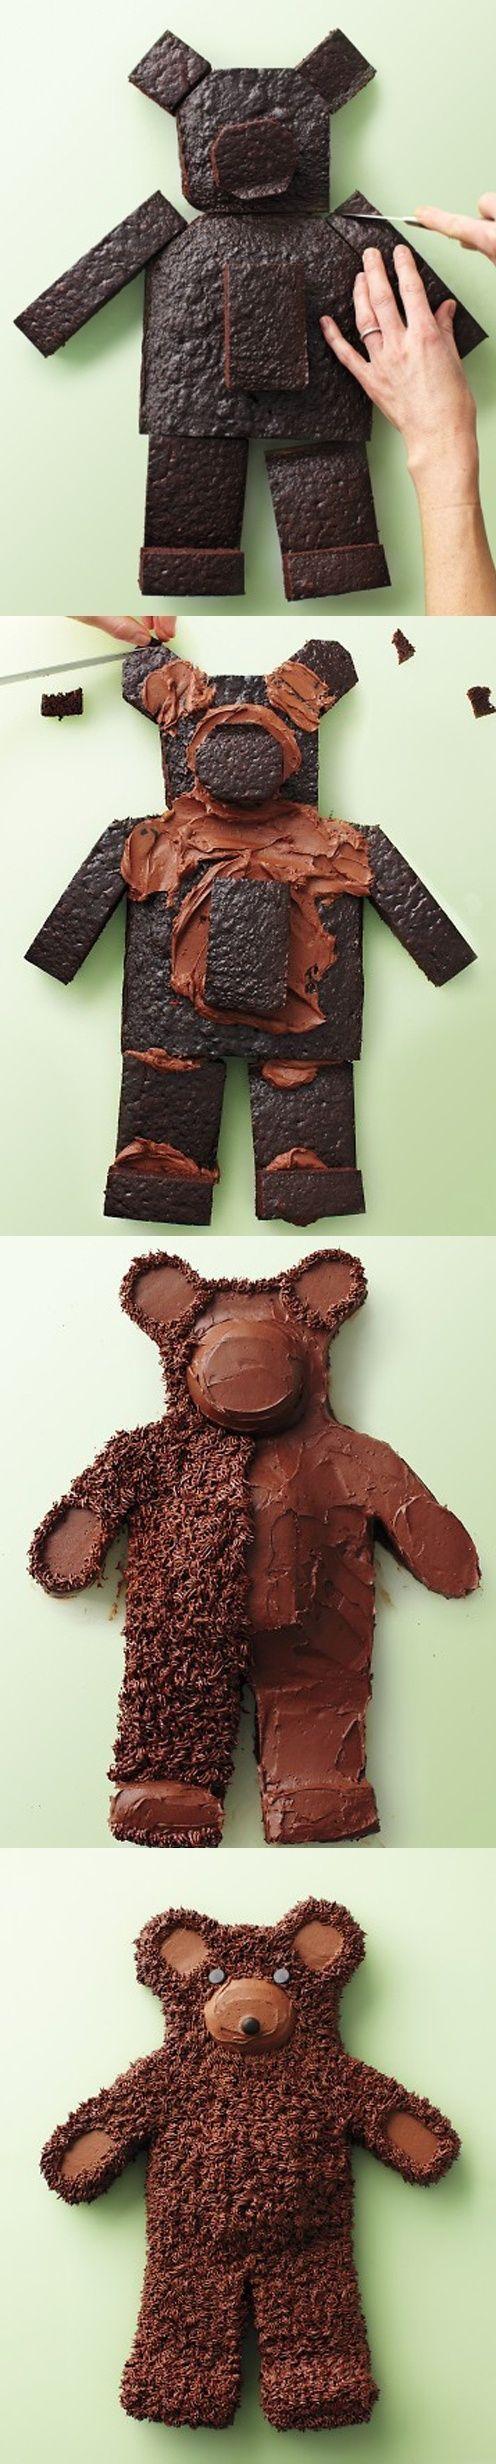 Teddy Bear Chocolate Cake